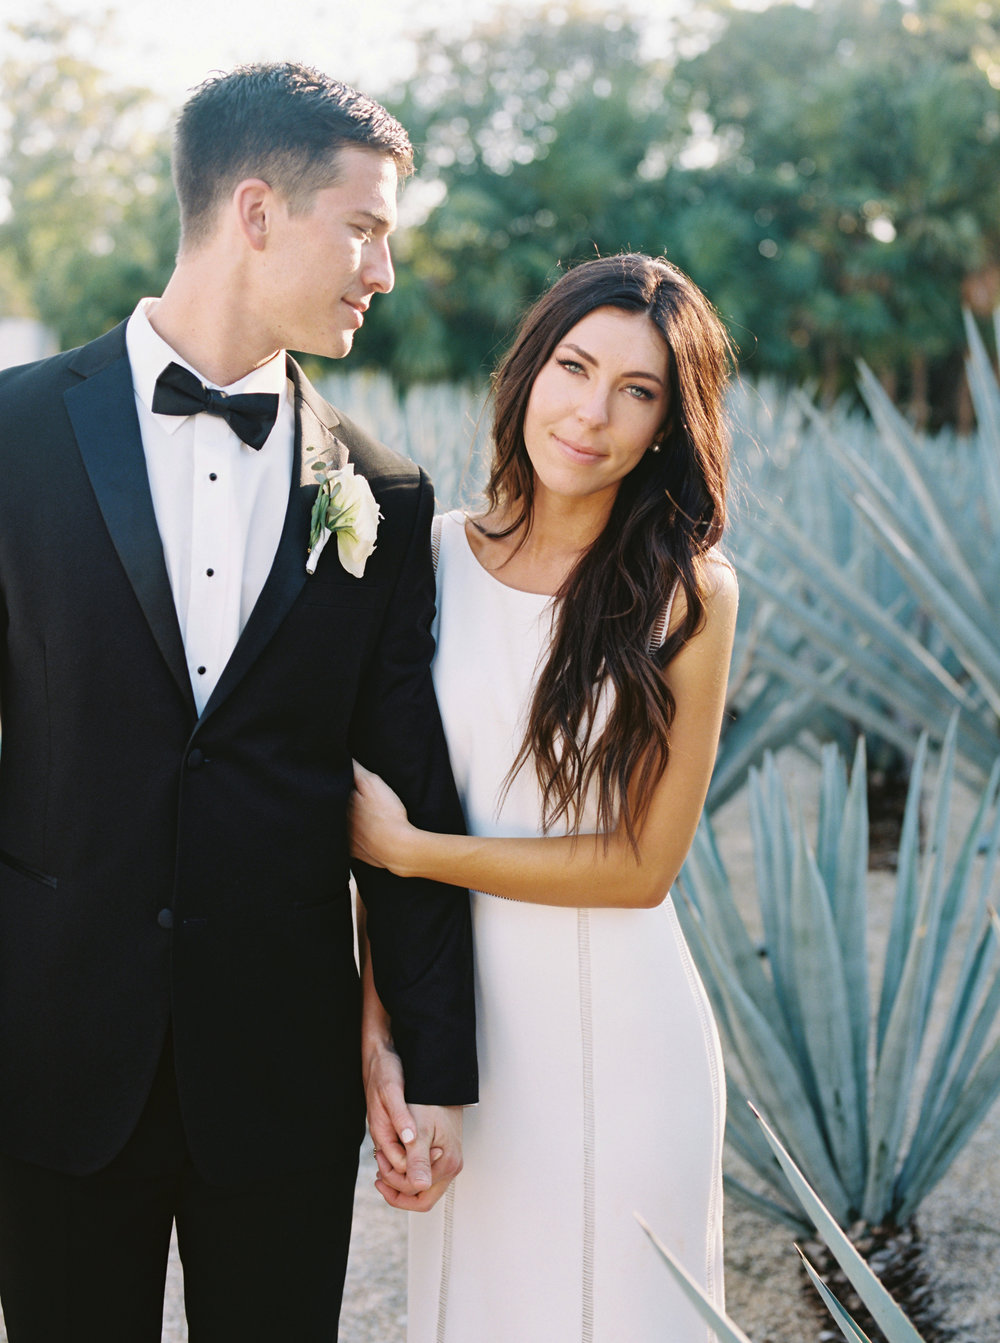 Kyle John l Fine Art Wedding Photography l Chicago, Copenhagen, California, New York, Destination l Blog l Brooke Boyd_The Film Poets_Tulum Wedding_26